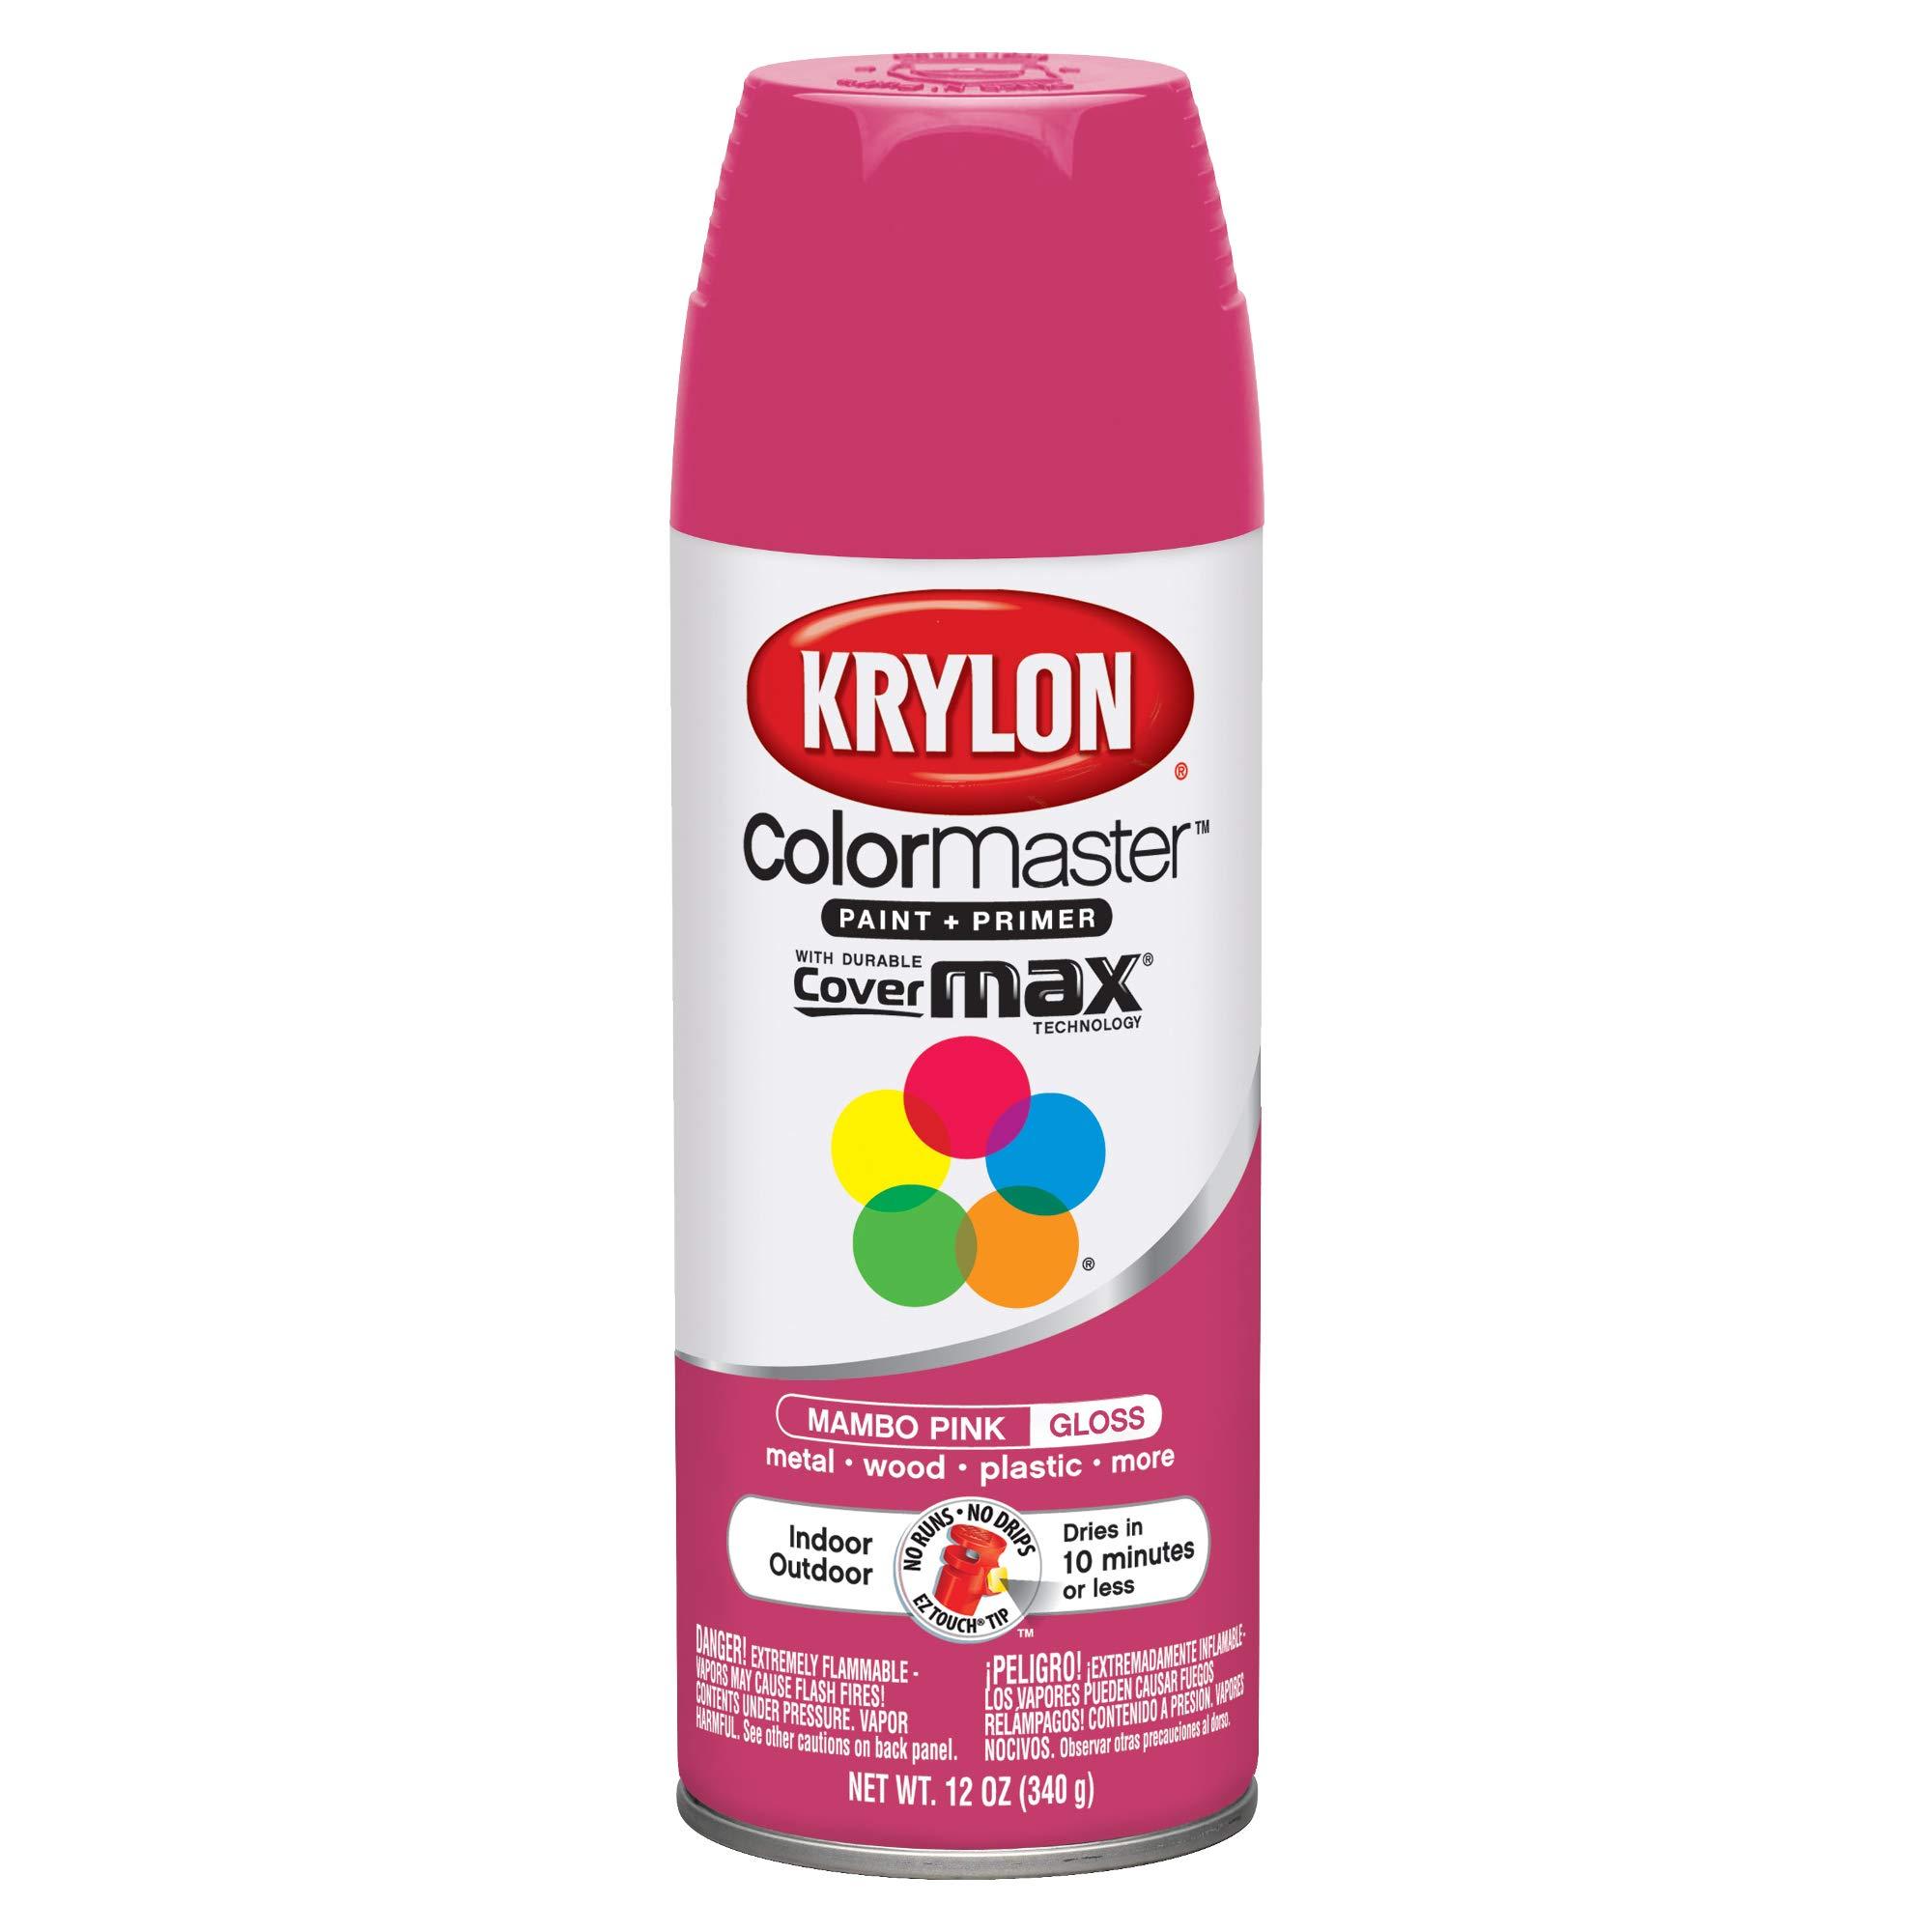 Krylon K05357107 ColorMaster Primer Aerosol Paints Mambo Pink